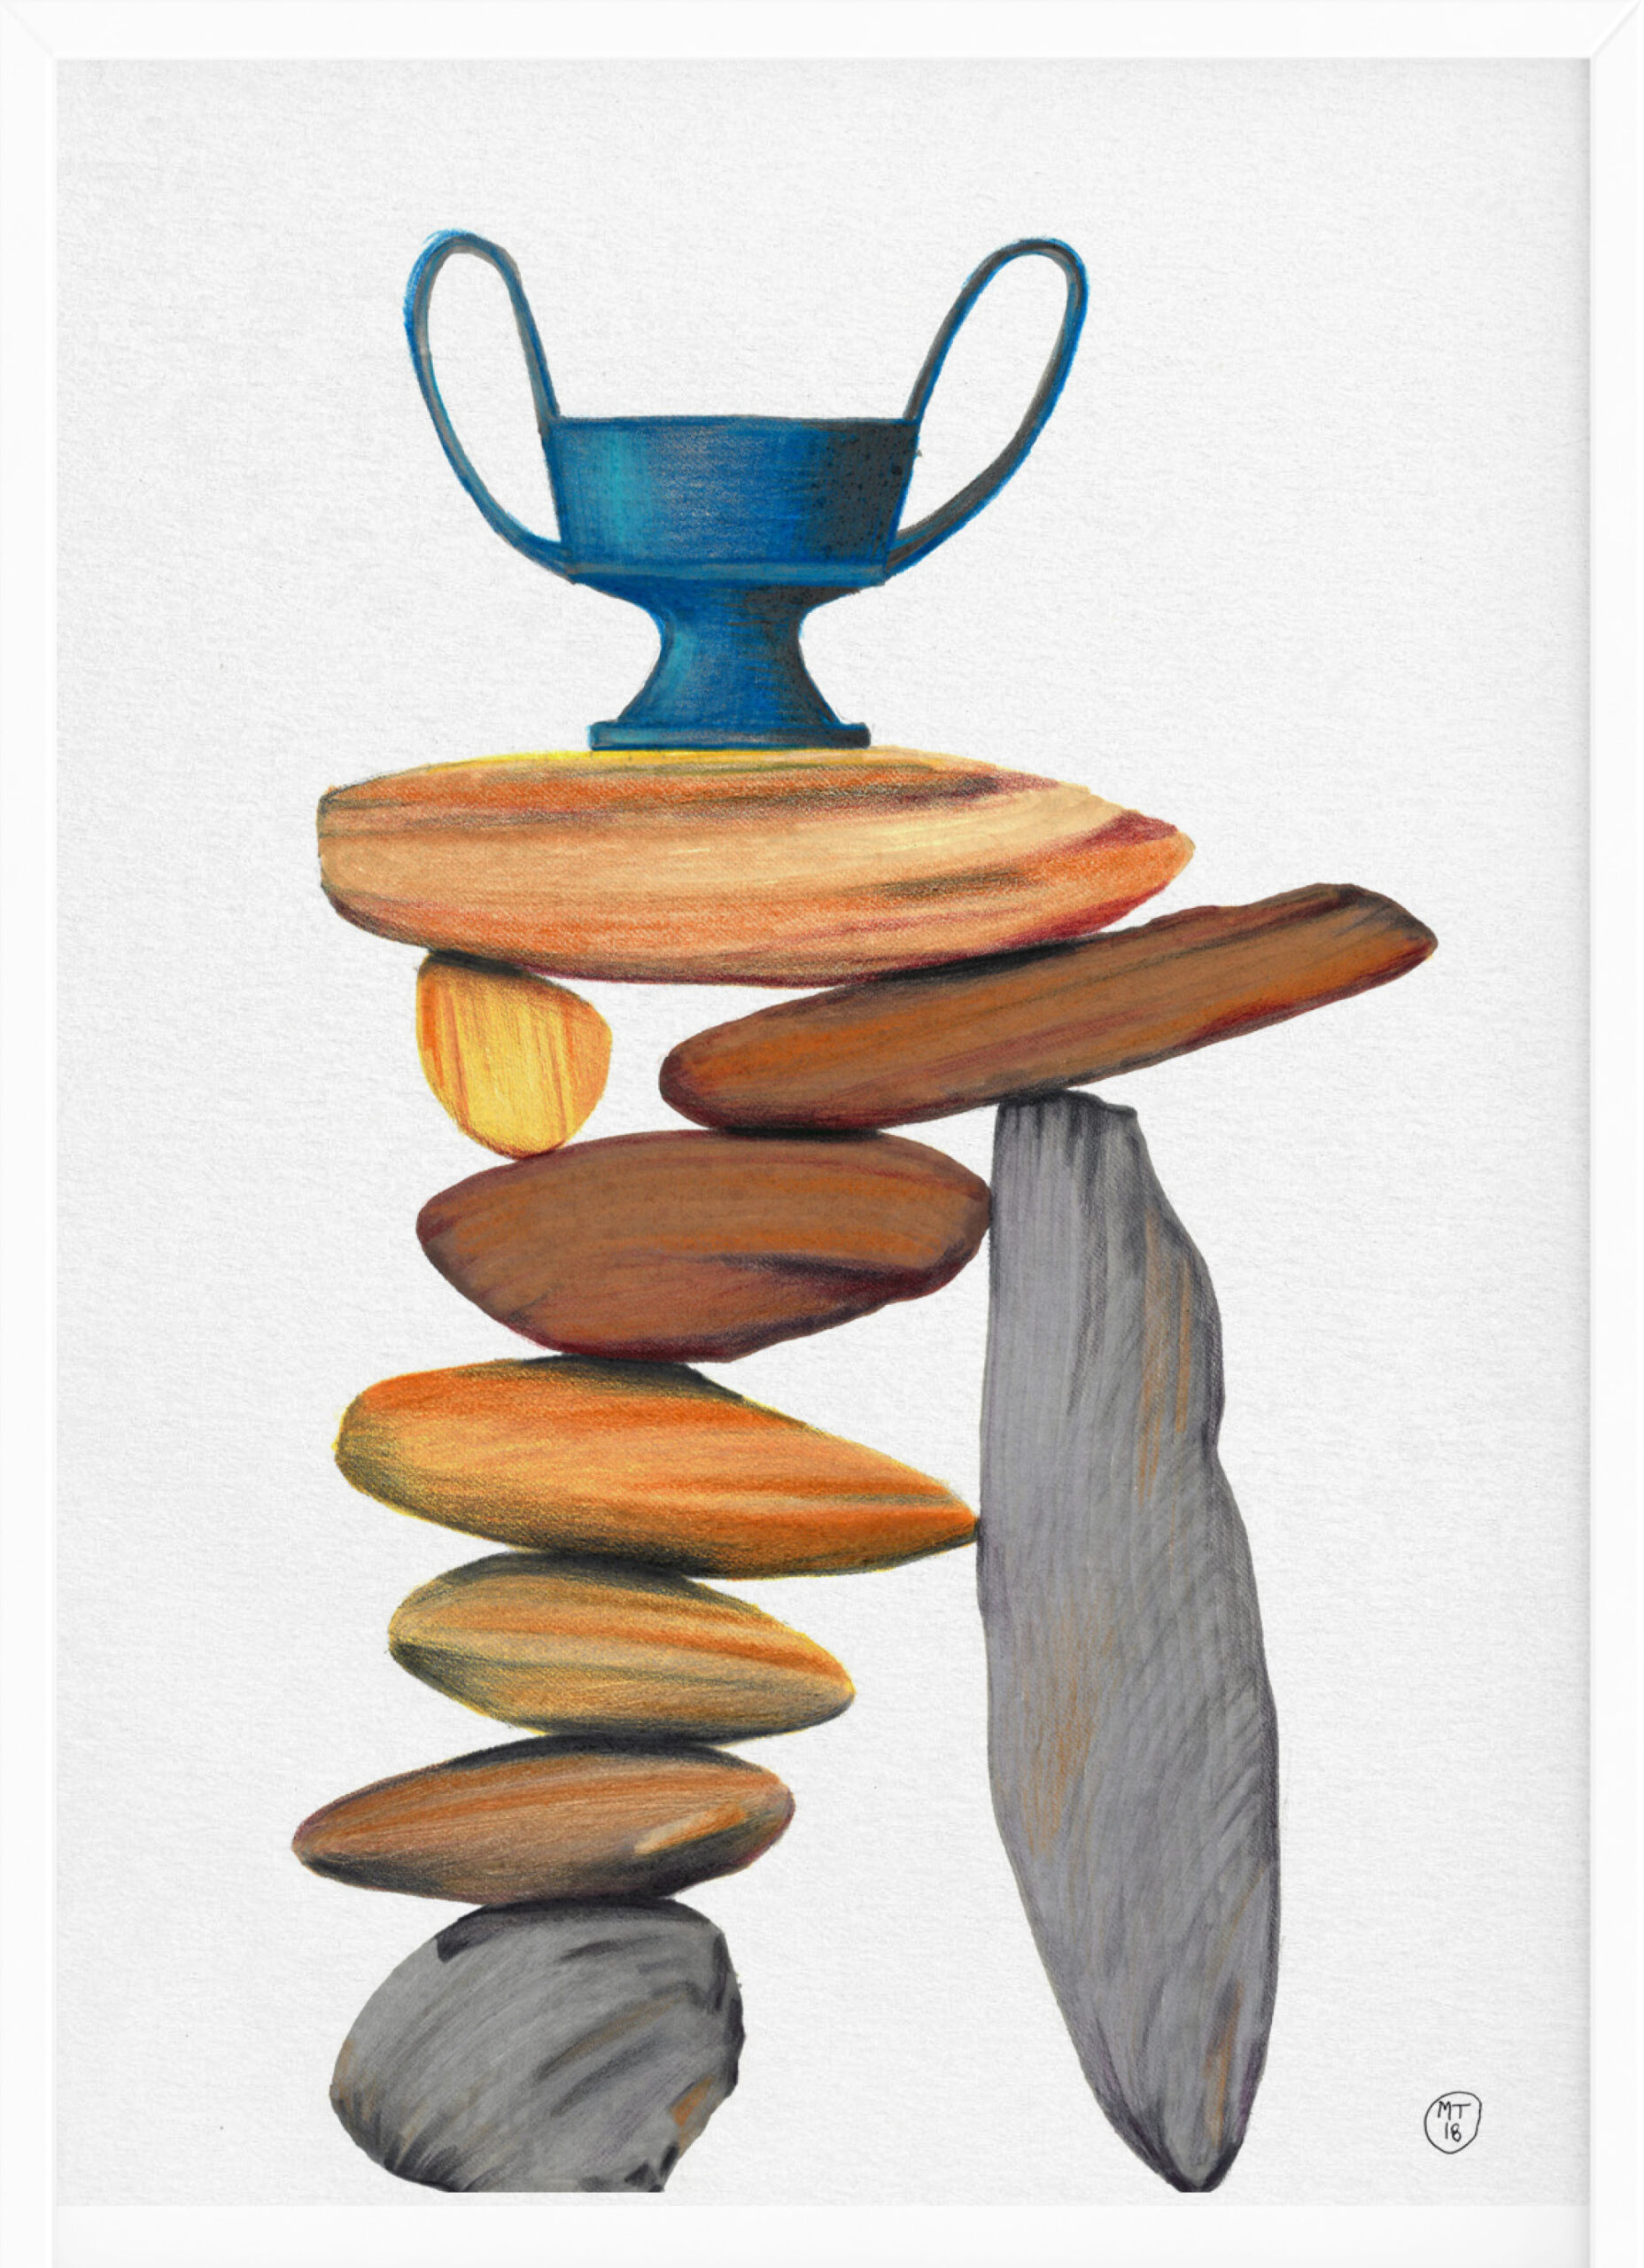 Caos | Drawings | Mario Trimarchi Design5